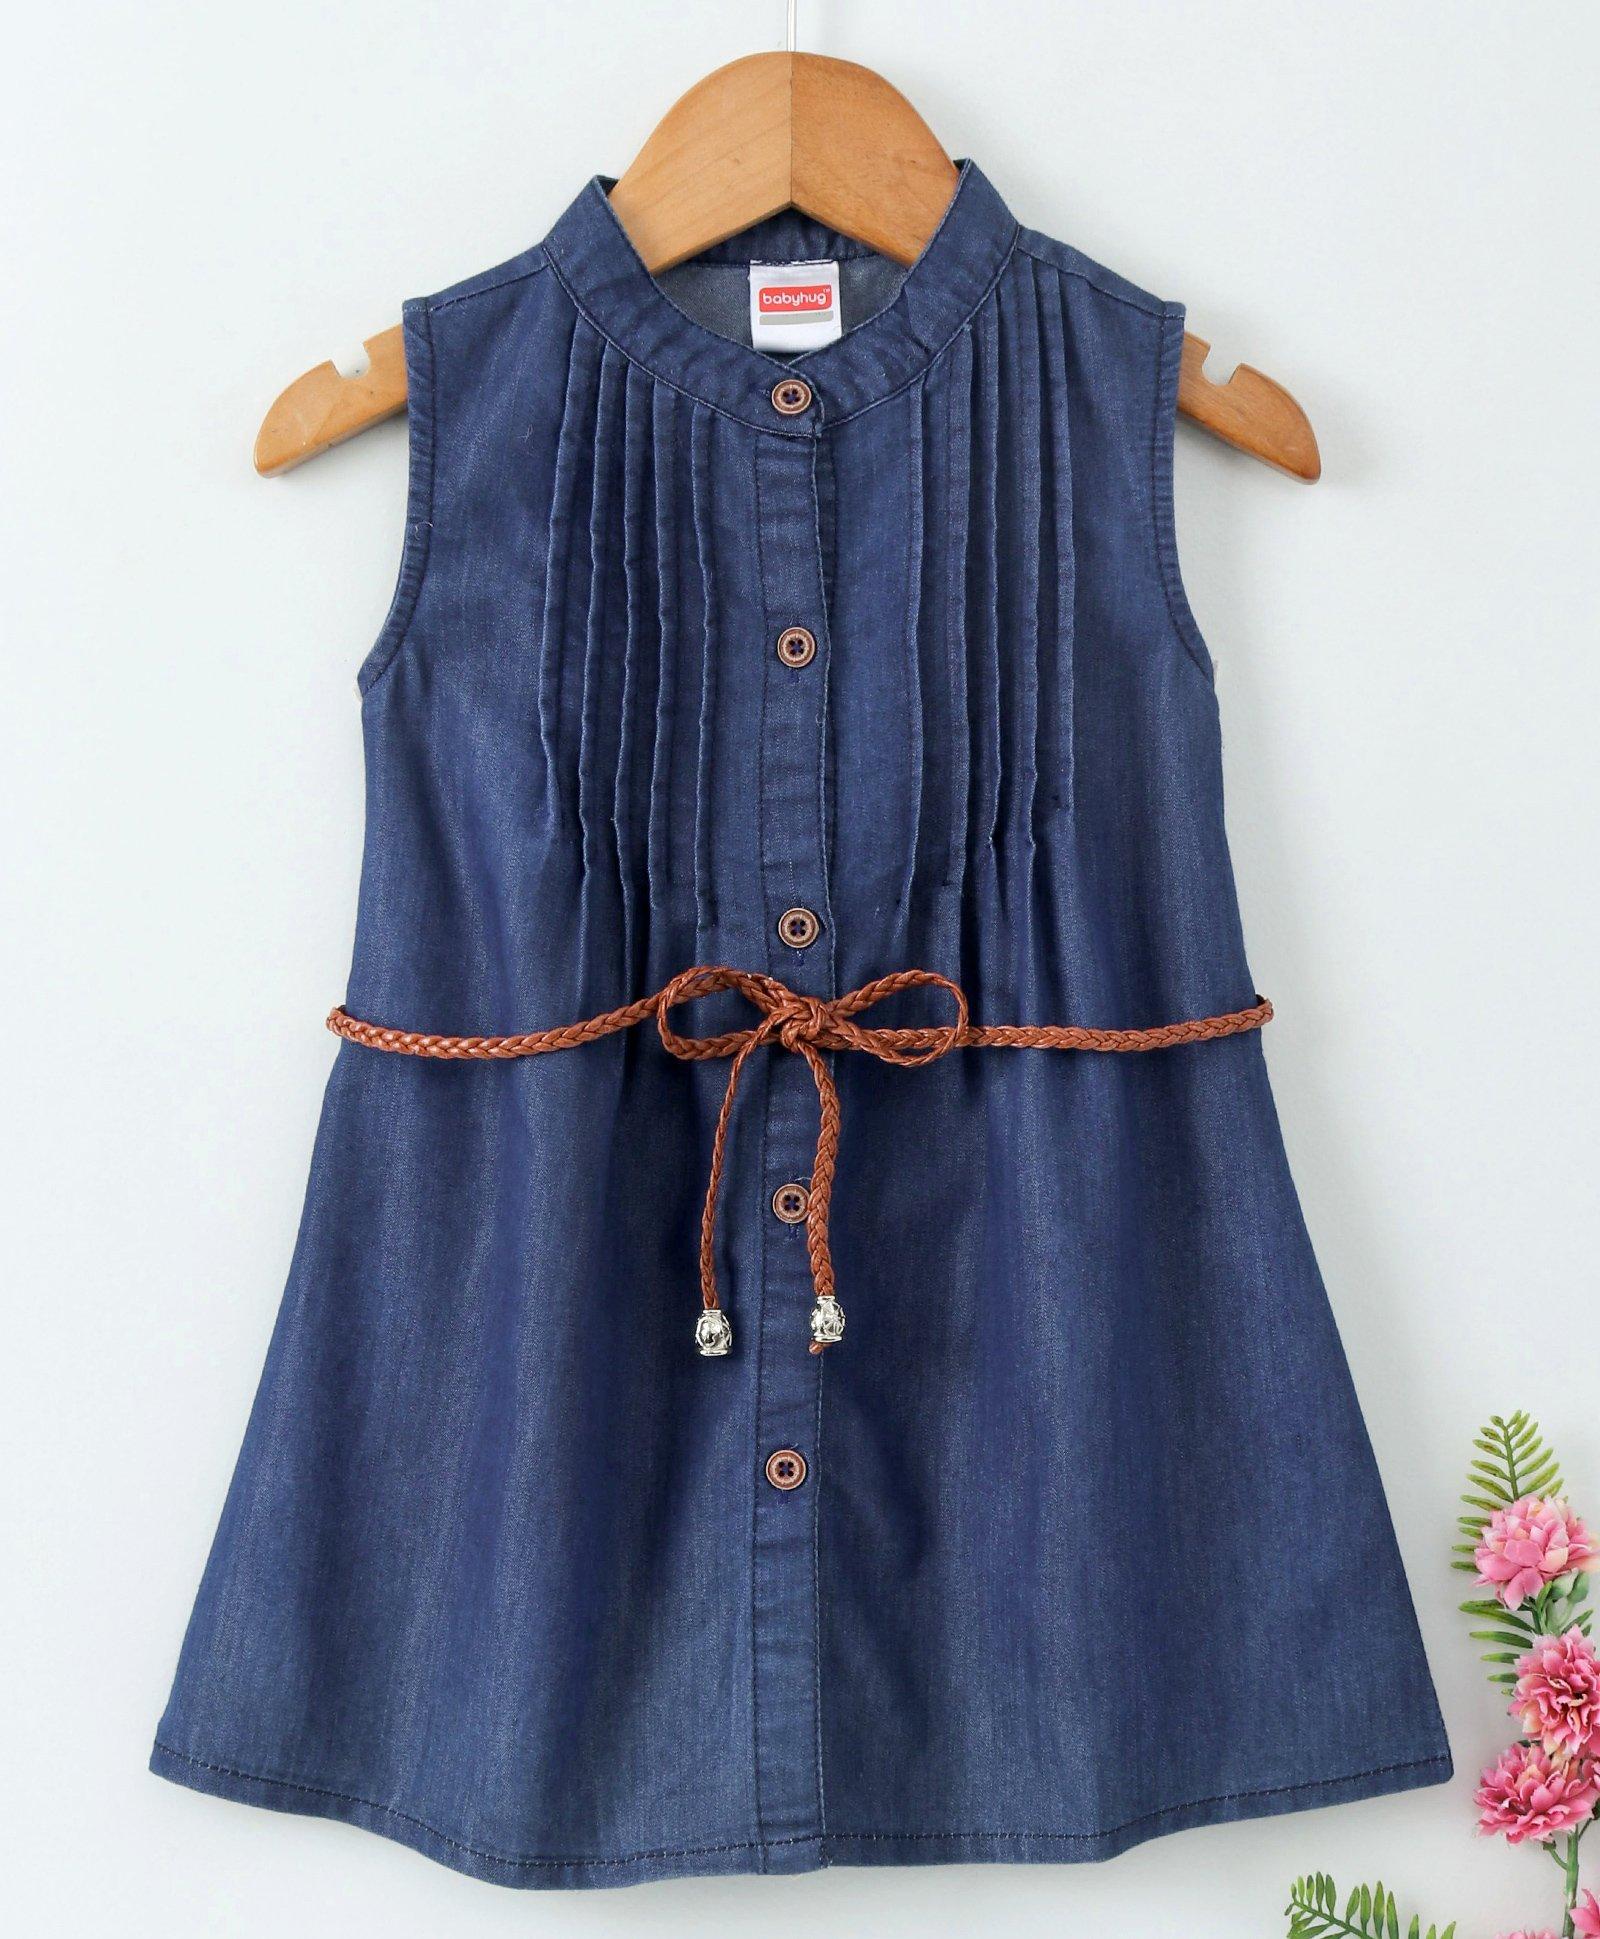 cab2d87c754 Buy Babyhug Sleeveless Denim Frock With Belt Dark Blue for Girls (2 ...